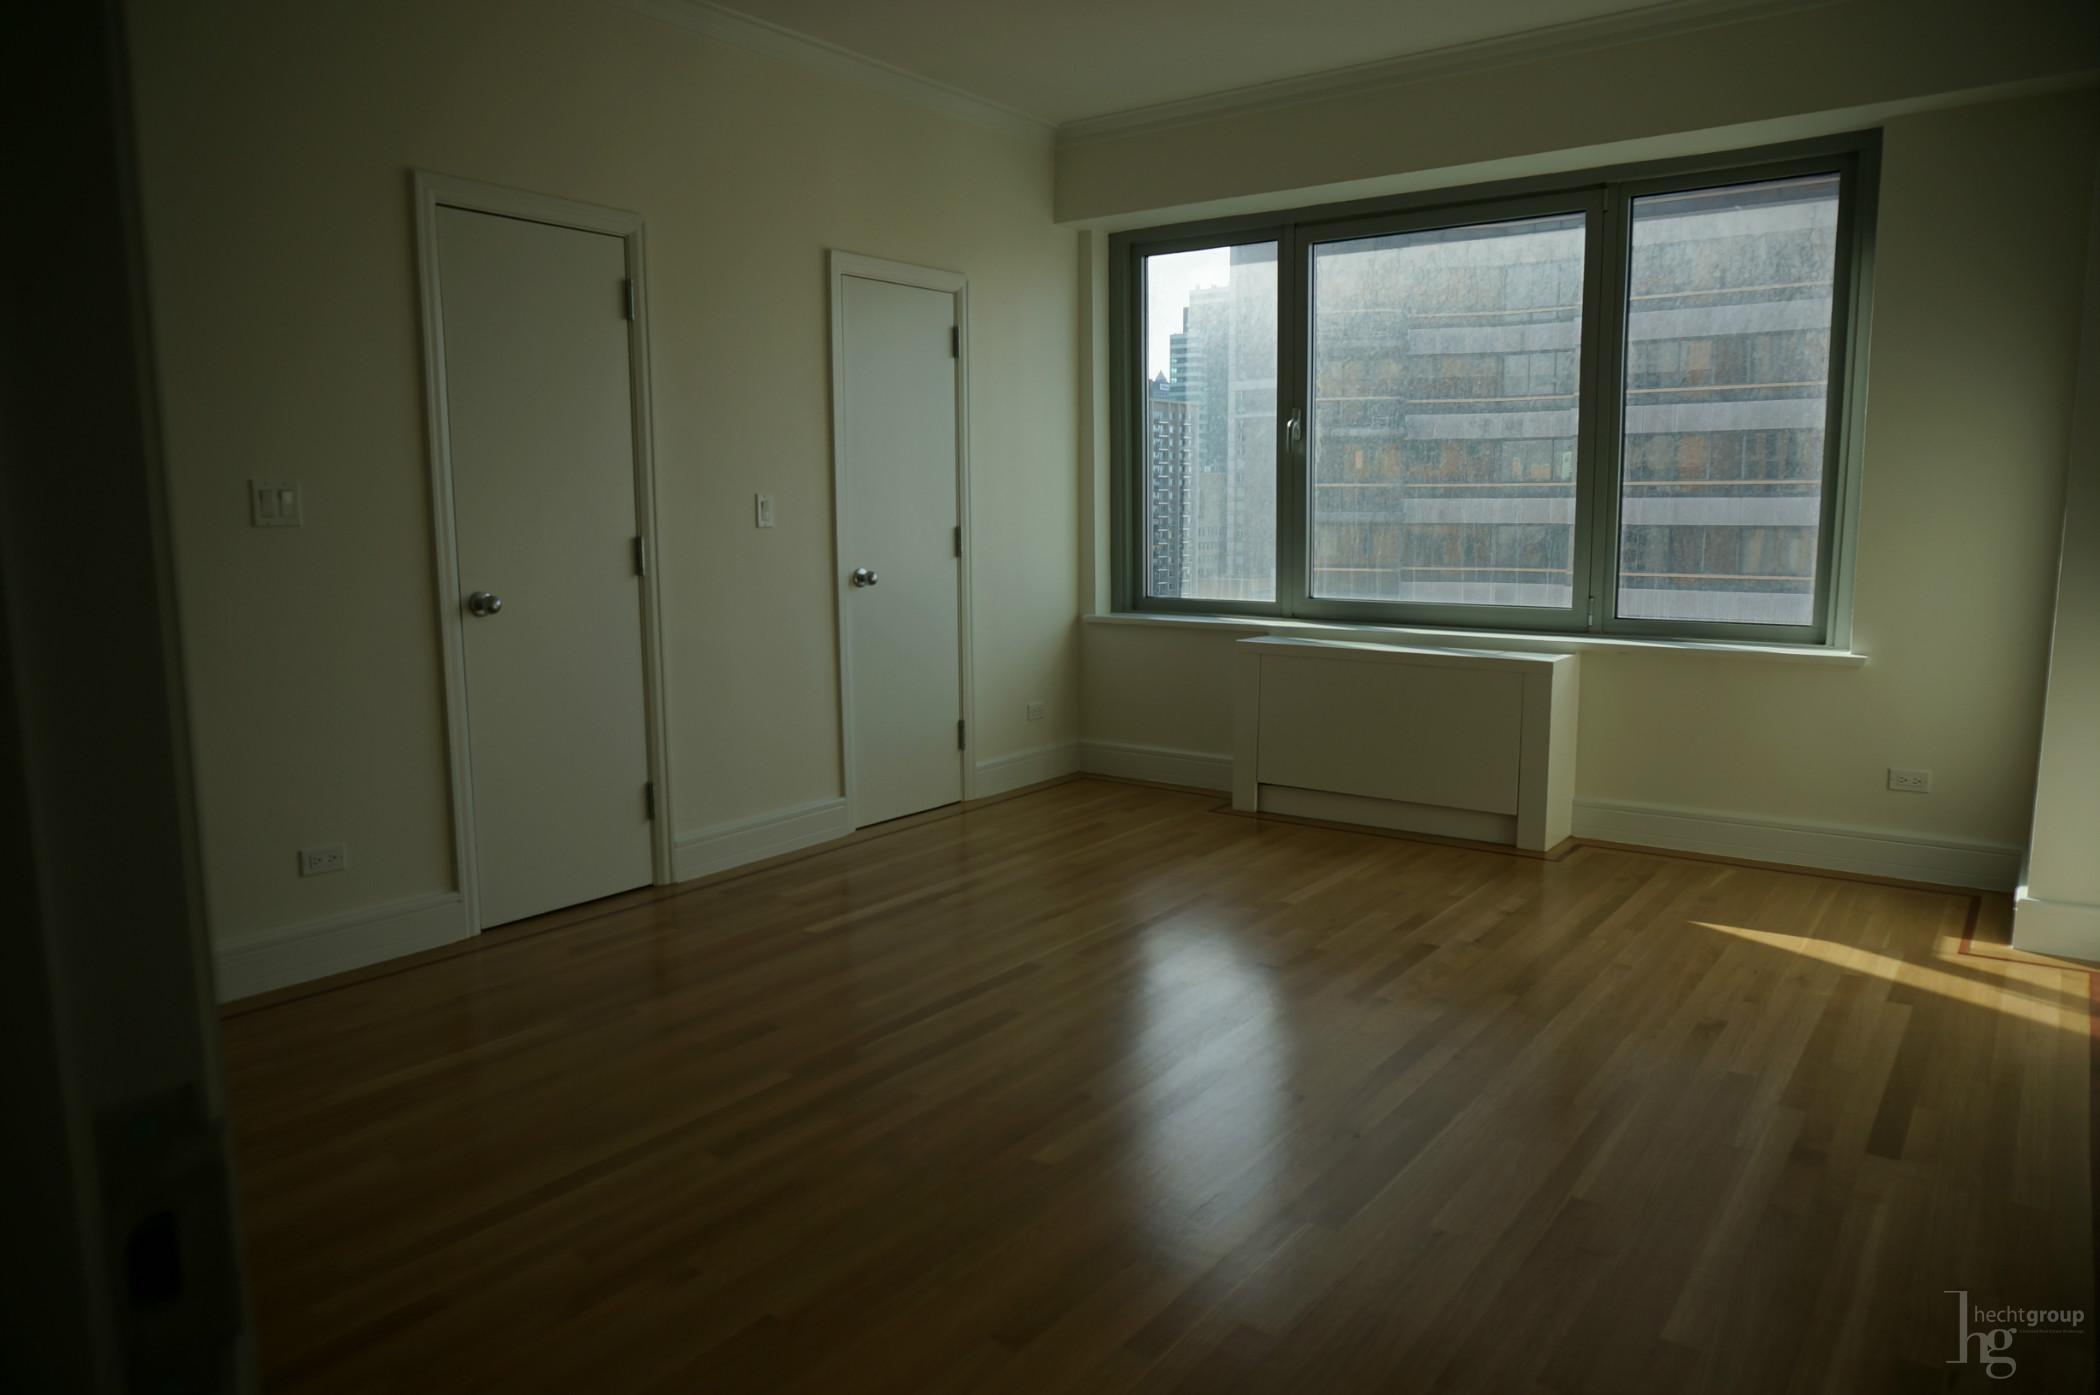 200 E 62ND ST , #25A, new york, NY 10065 | New York Apartments